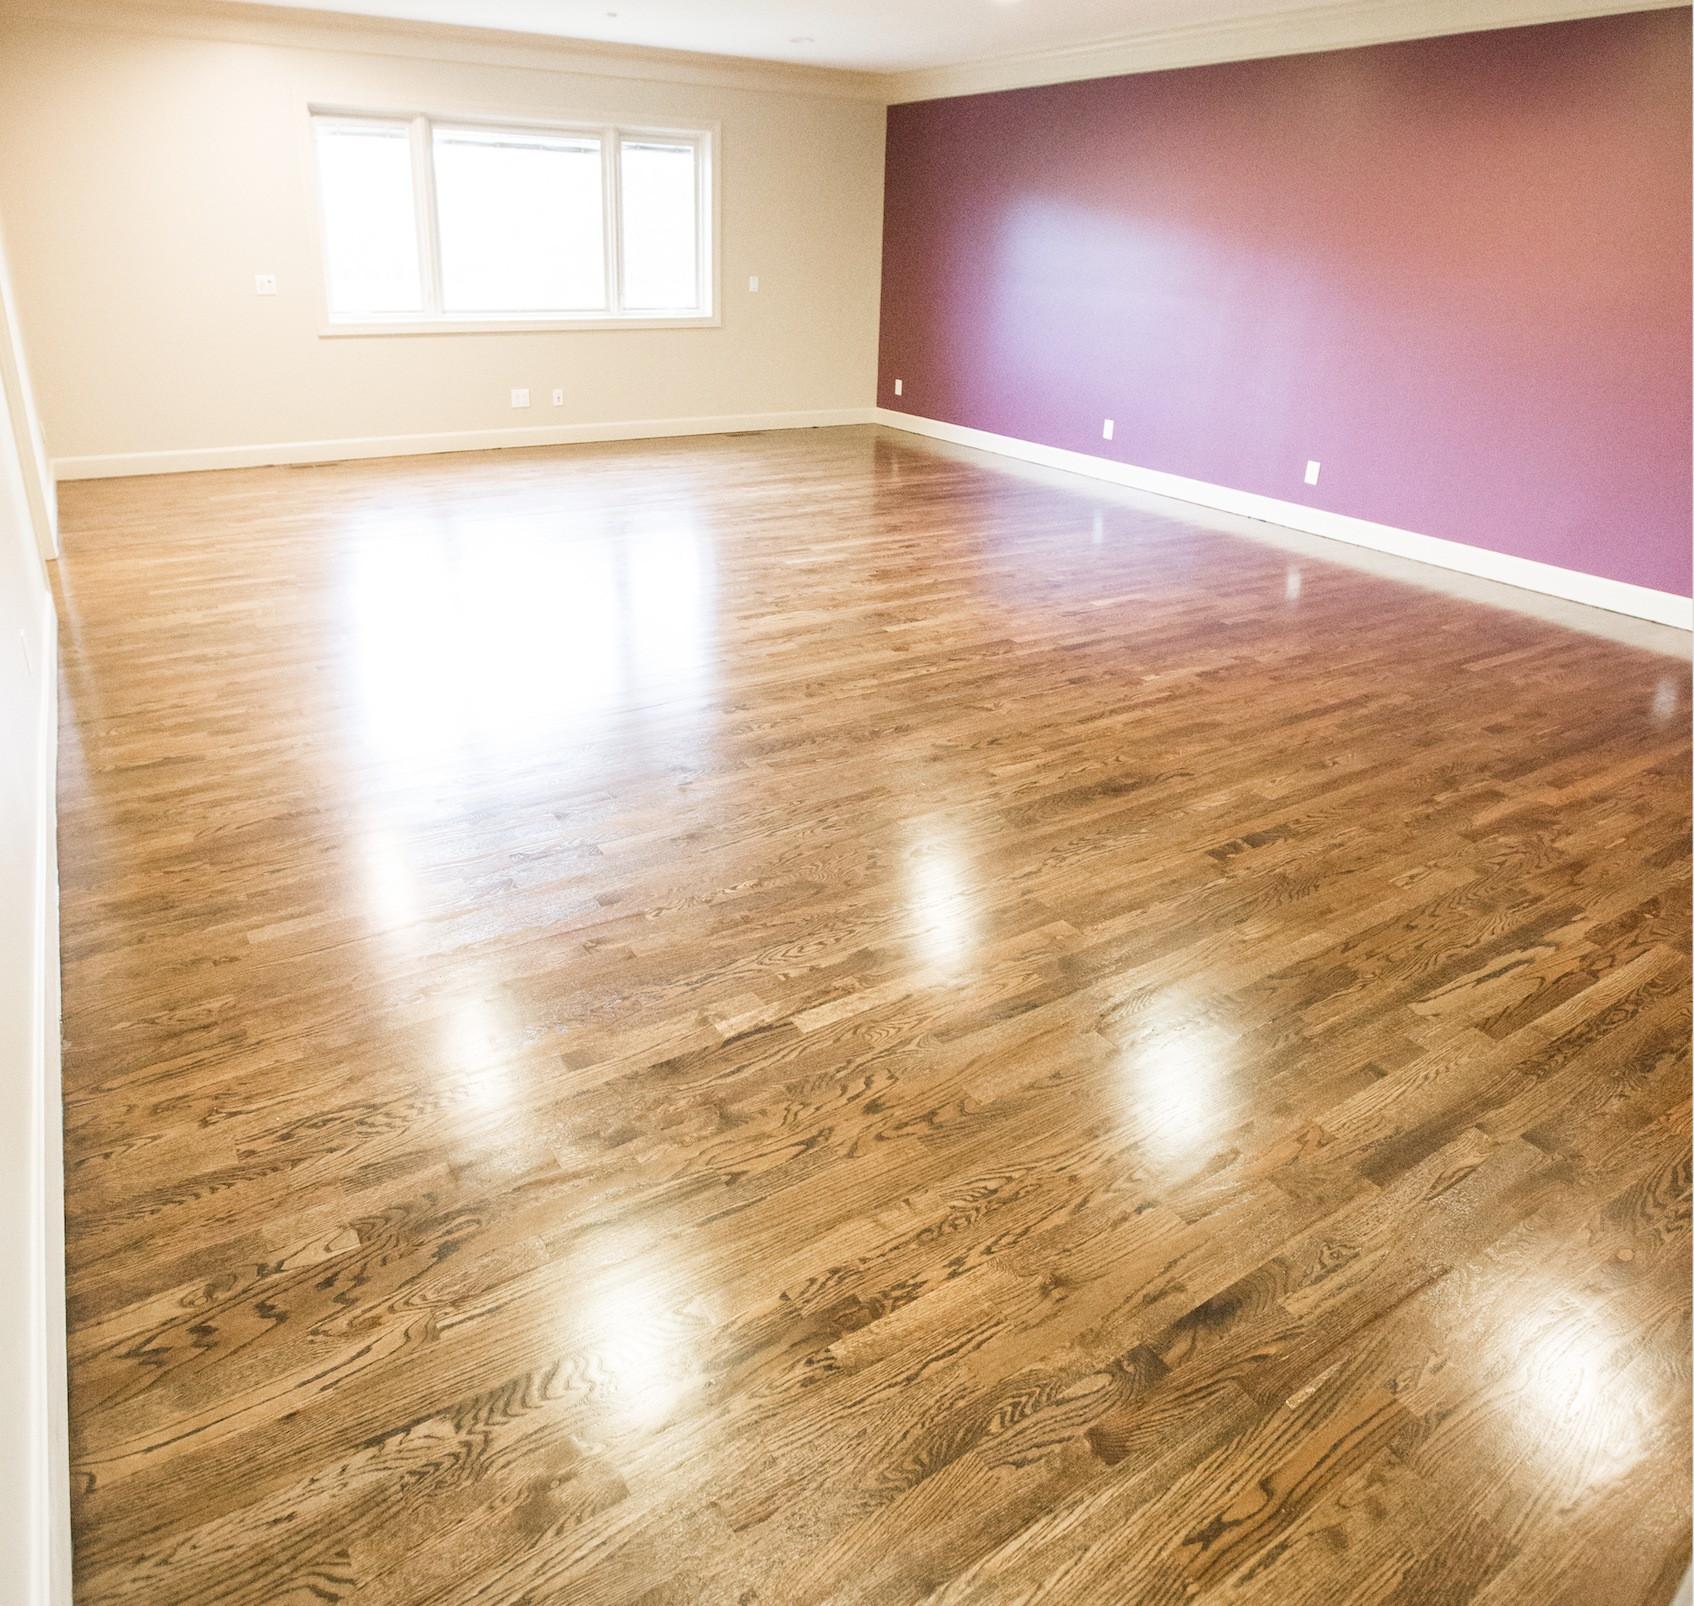 mm hardwood floors of premier laminate flooring fresh piedmont oak is a versatile warm pertaining to premier laminate flooring unique premier hardwood floors 27 best dark hardwoods pinterest gallery of premier laminate